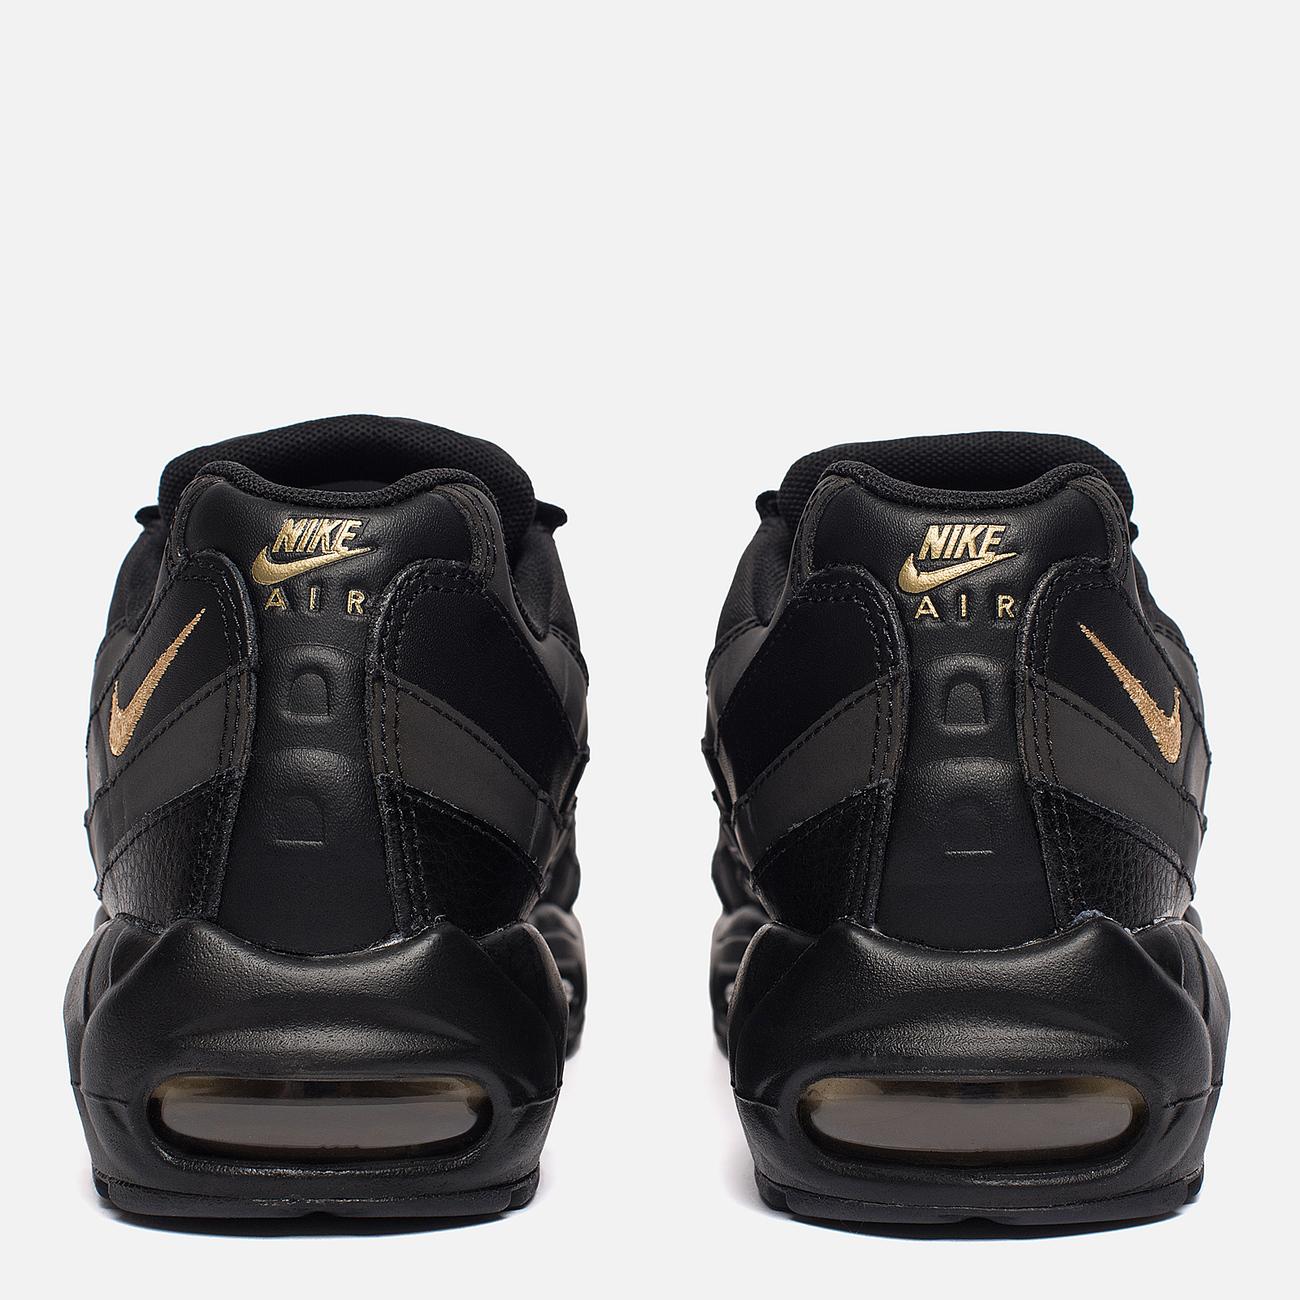 Мужские кроссовки Nike Air Max 95 Premium SE 924478 003